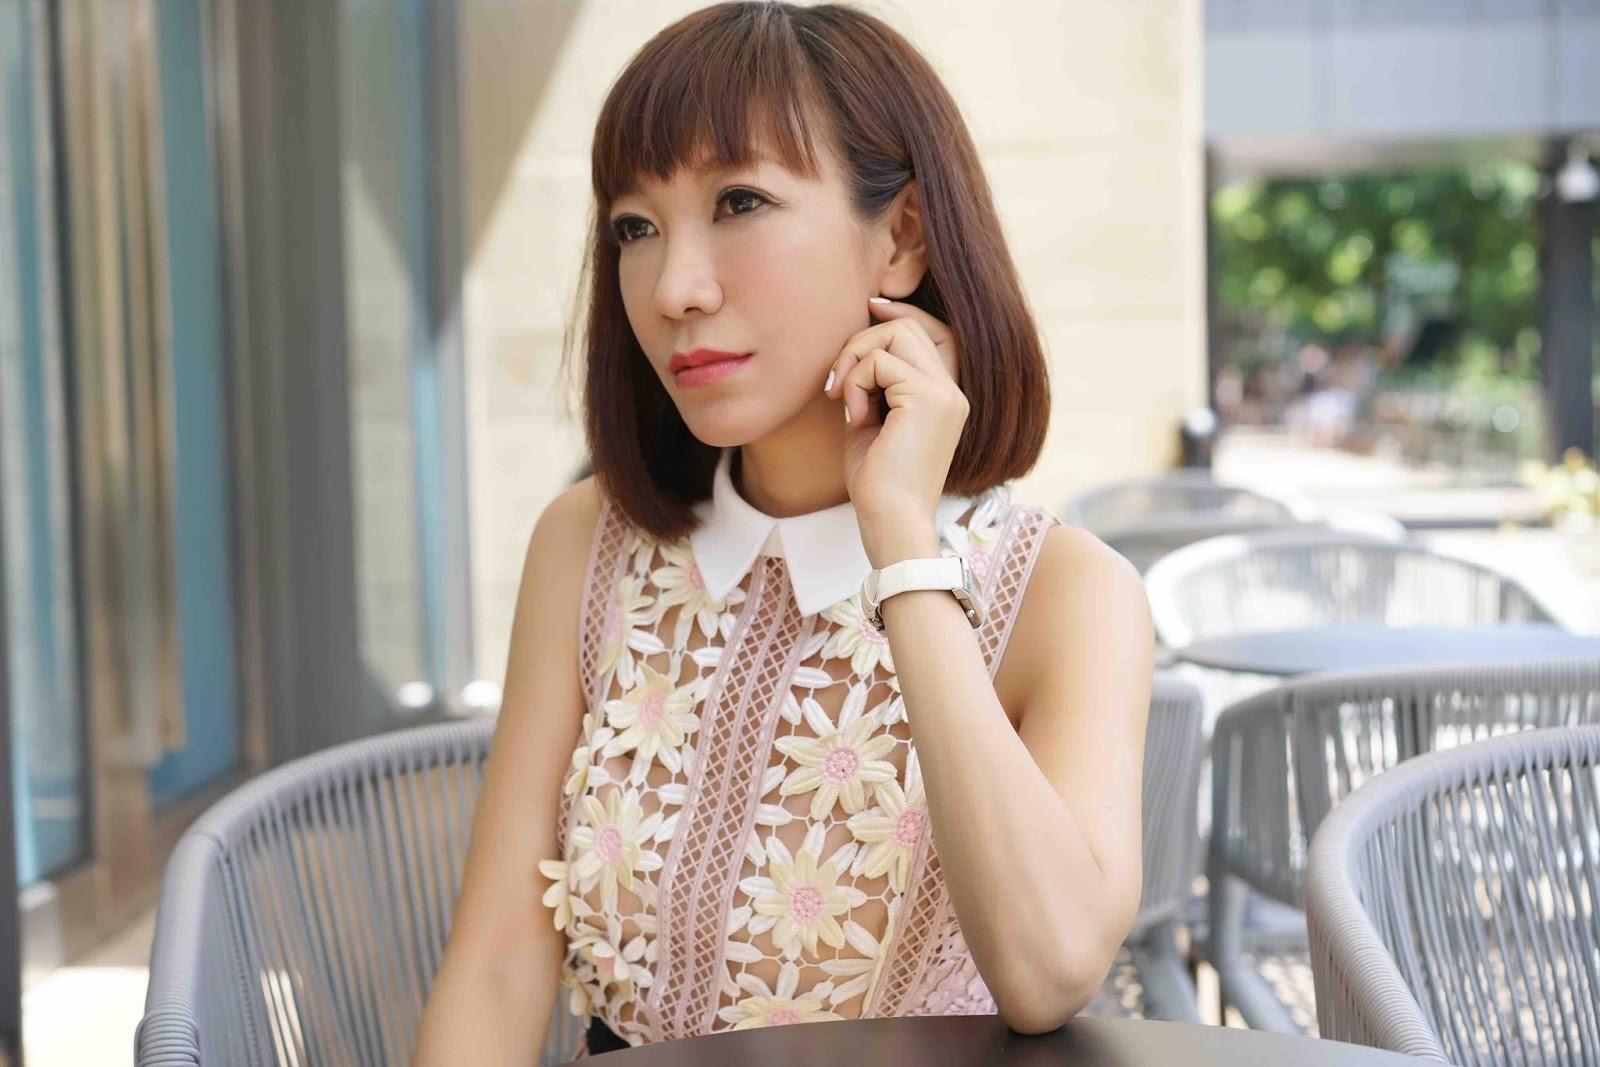 Janice wong fashion blogger